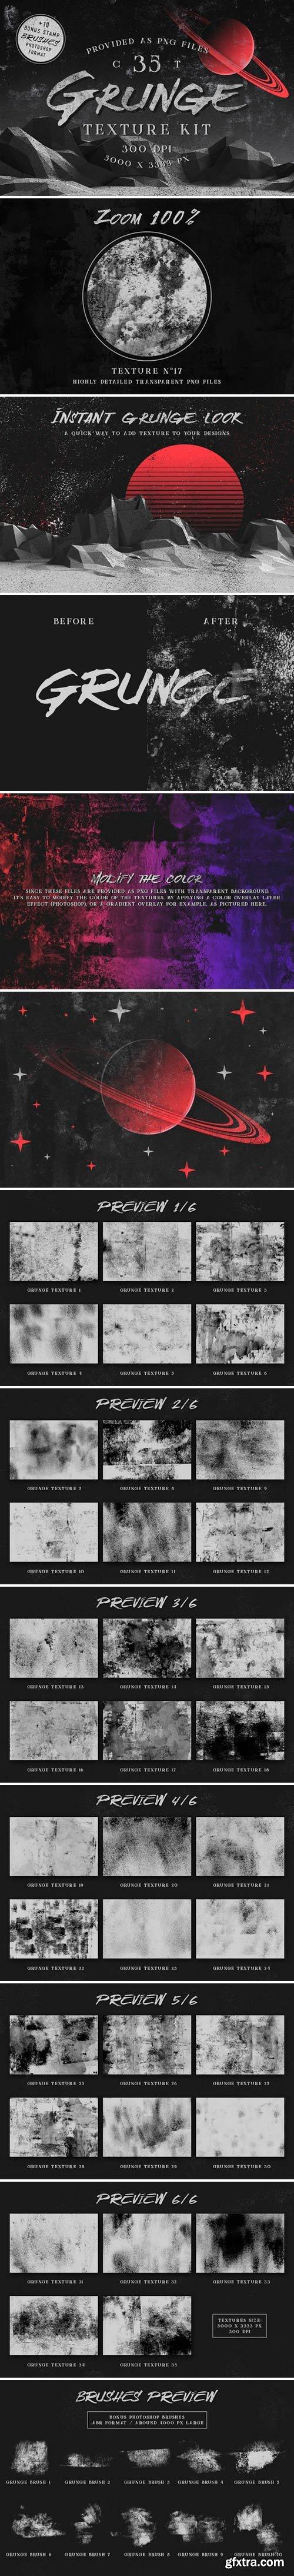 CM - Grunge texture kit 2321502